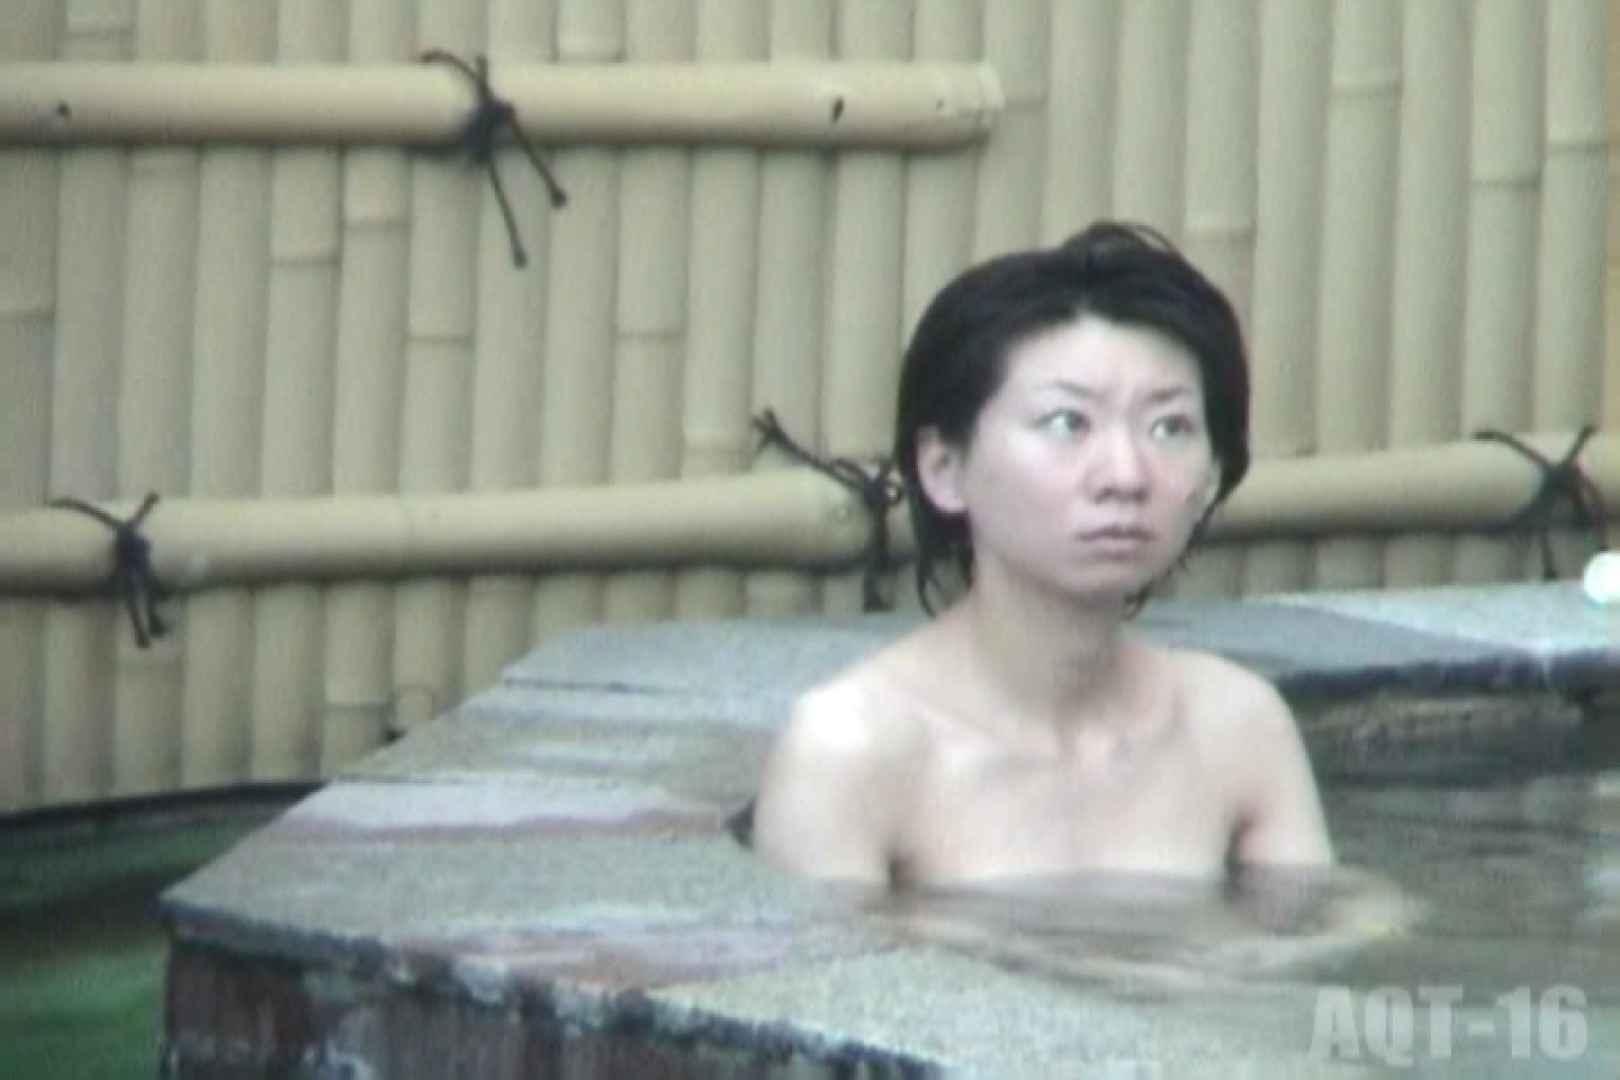 Aquaな露天風呂Vol.842 露天風呂編  82PIX 30